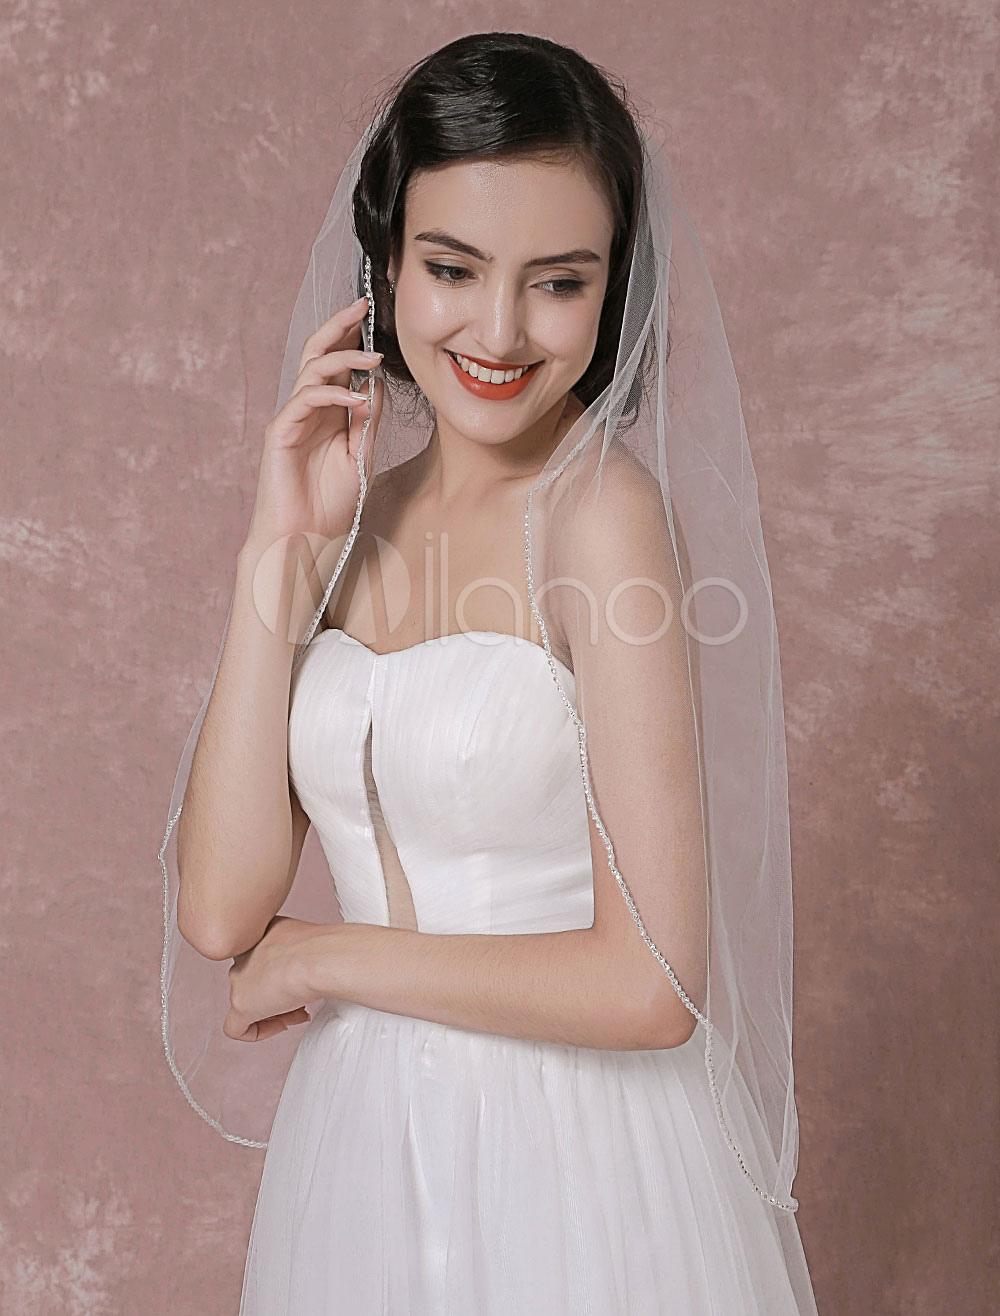 Buy Tulle Wedding Veil 1 Tier Beaded Edge Bridal Veil for $18.99 in Milanoo store